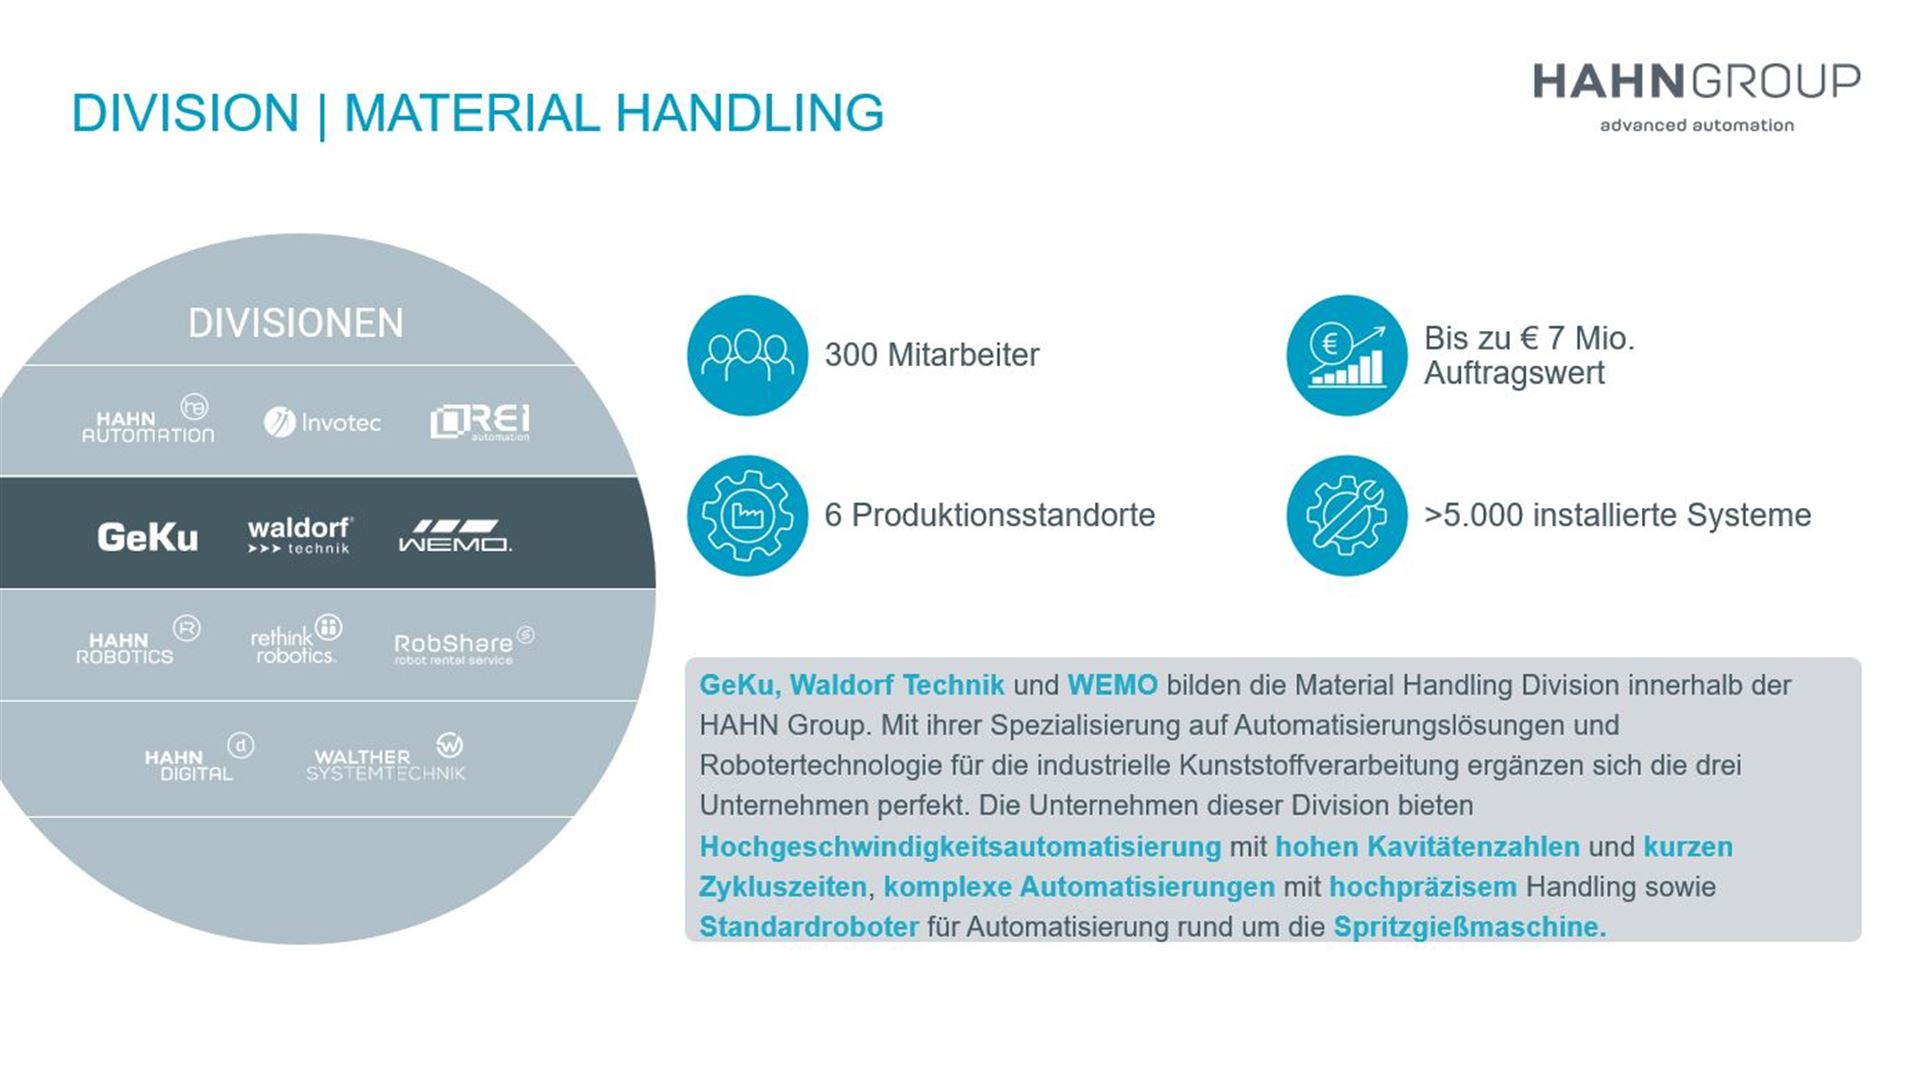 Material Handling Division